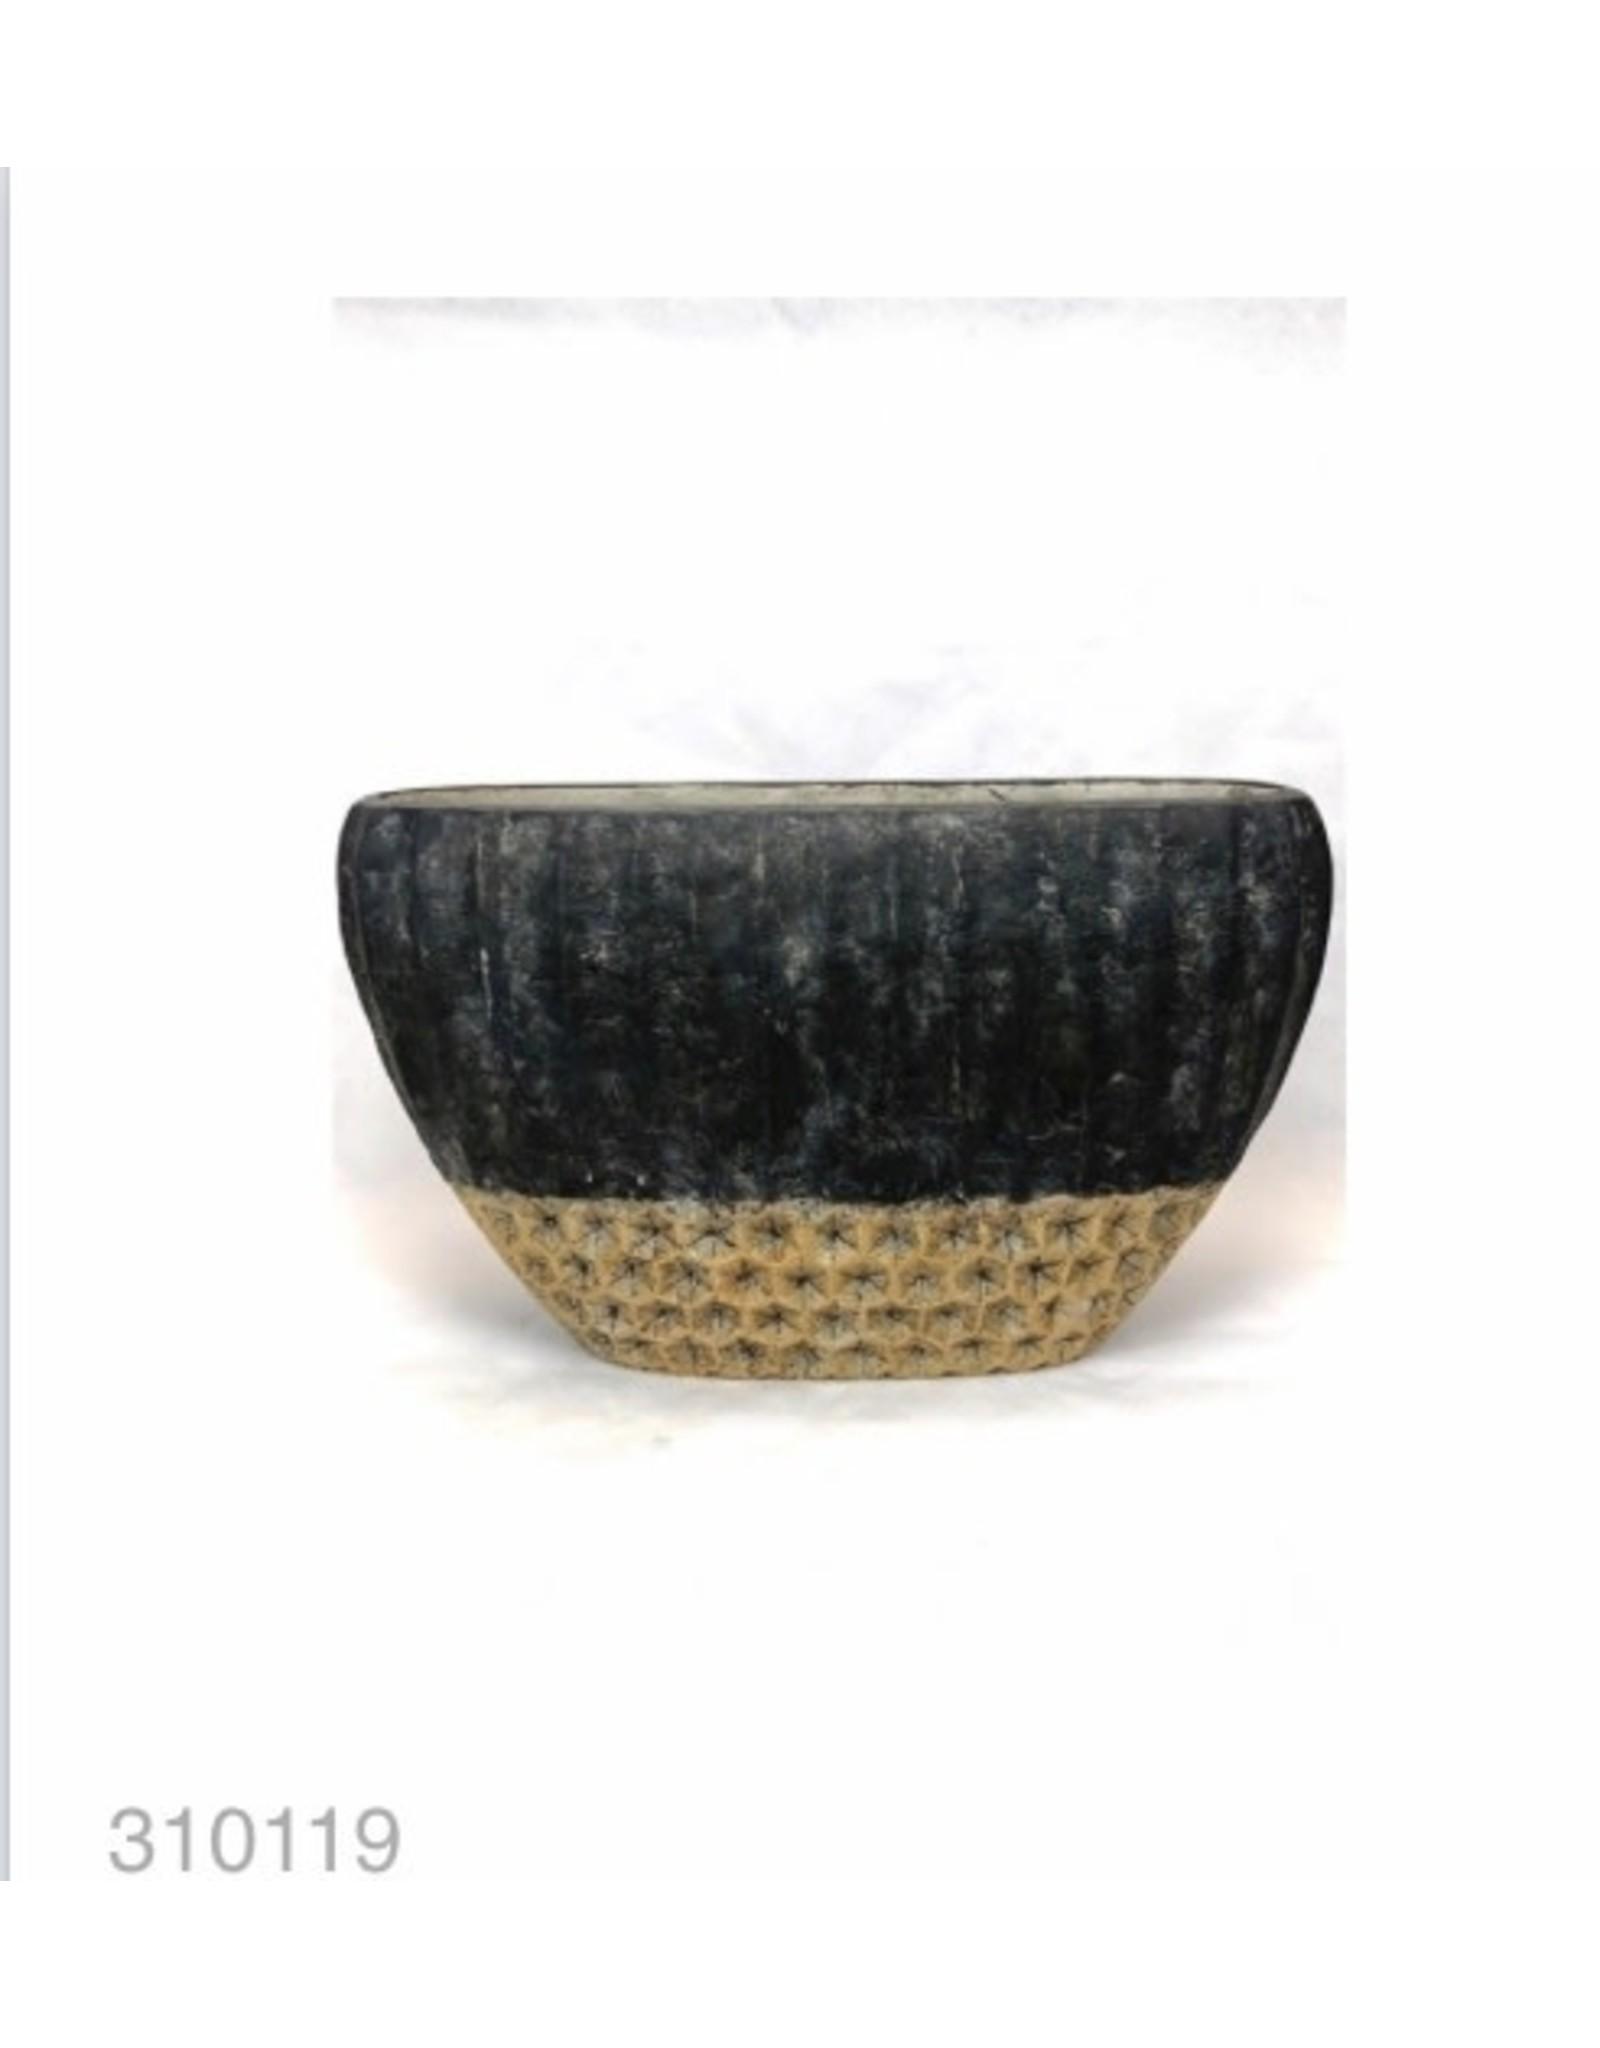 MANSION Bloempot Cement Oval High Pot 27.5*16*12.5 Copper Black